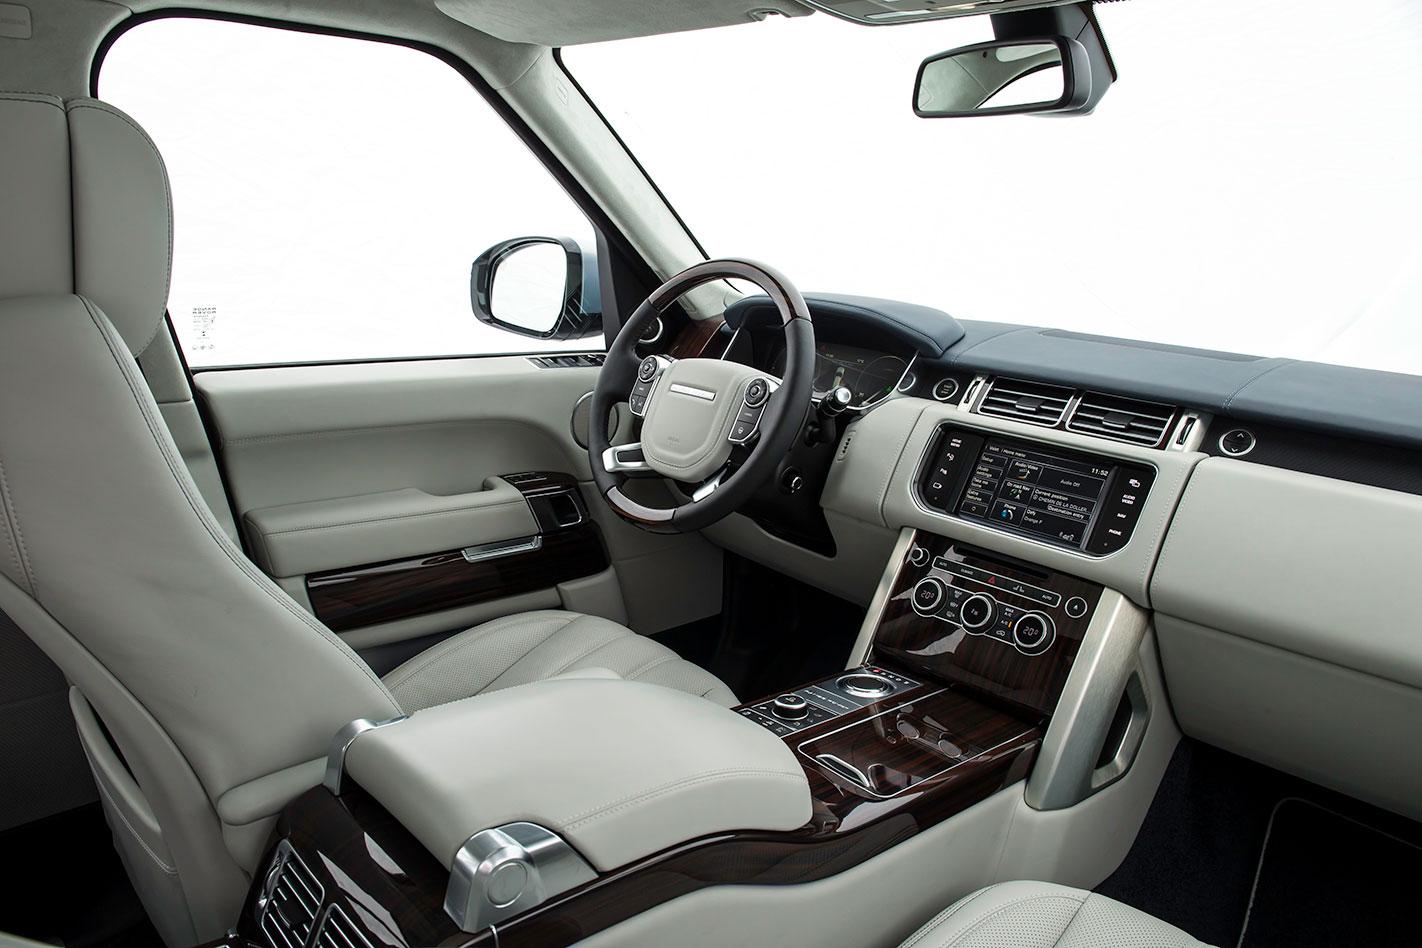 Range -Rover -SDV6-Hybrid -interior